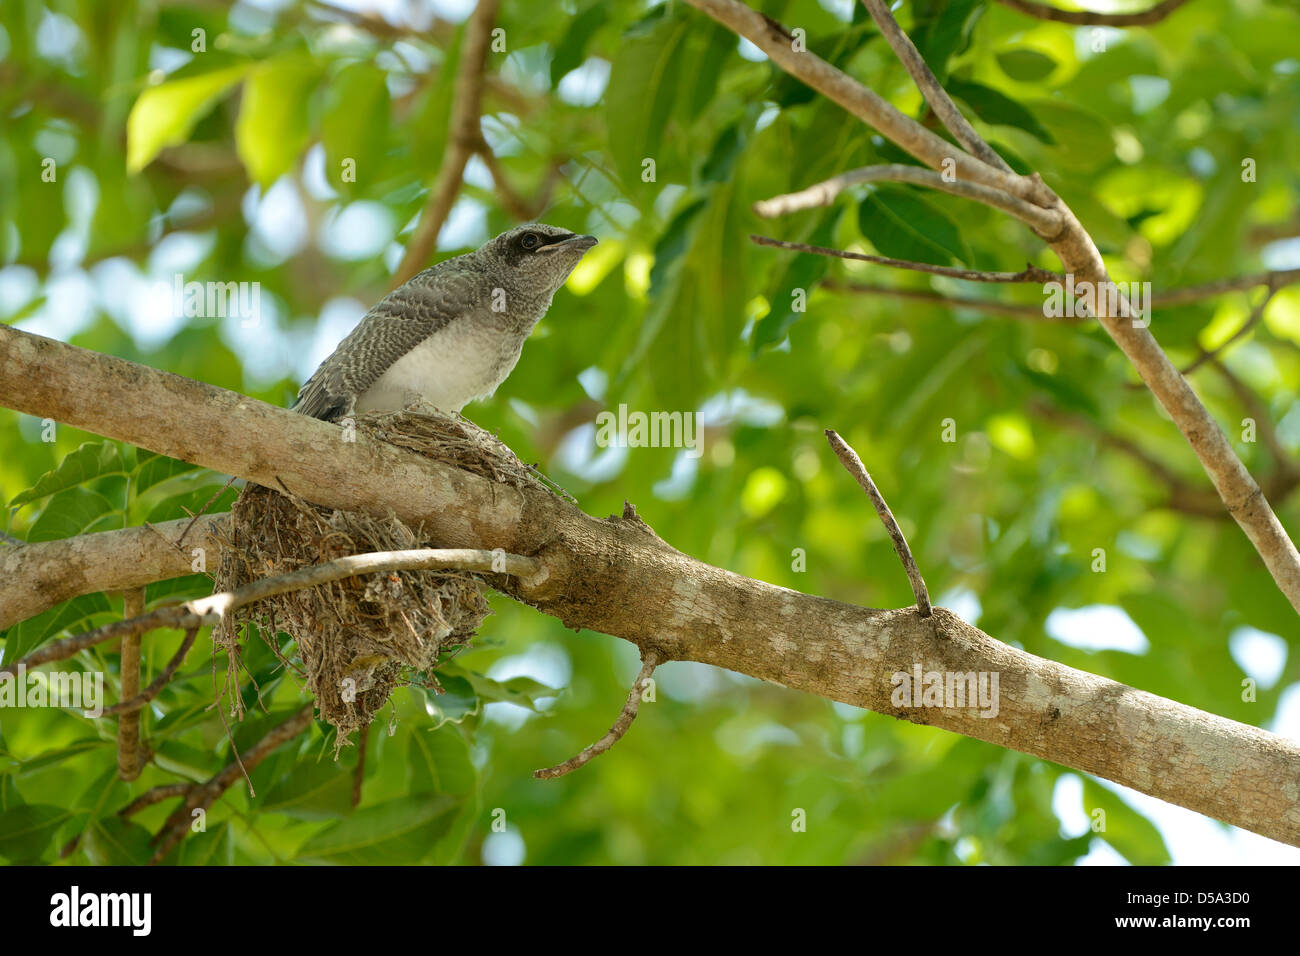 Black Faced Cuckoo Shrike Coracina Novaehollandiae Fledgeling Sat On Top Of Nest